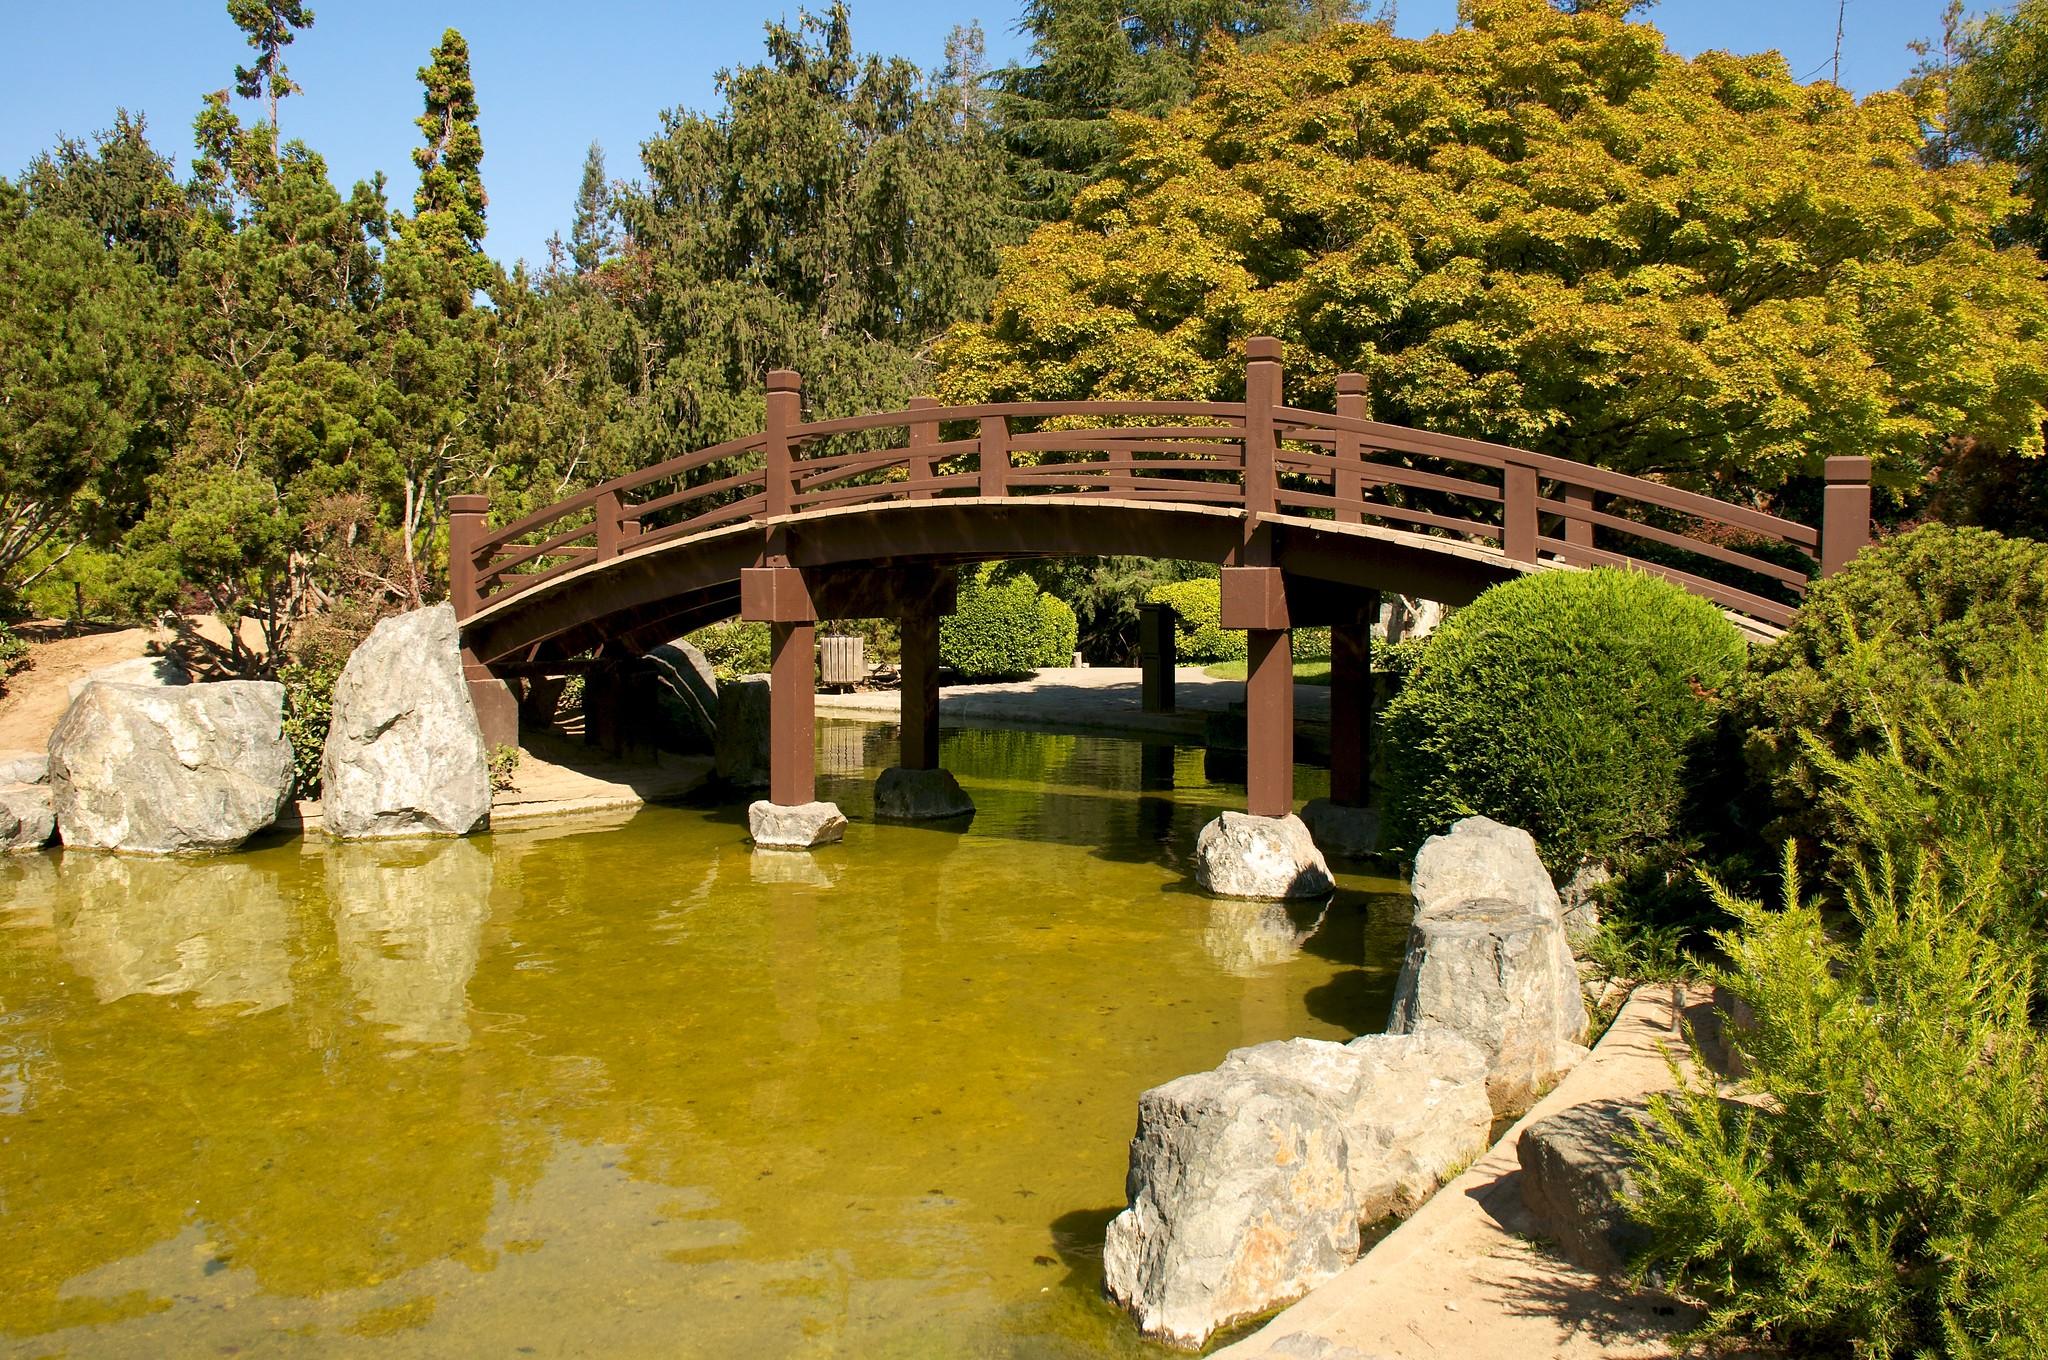 Things To Do in San Jose, California